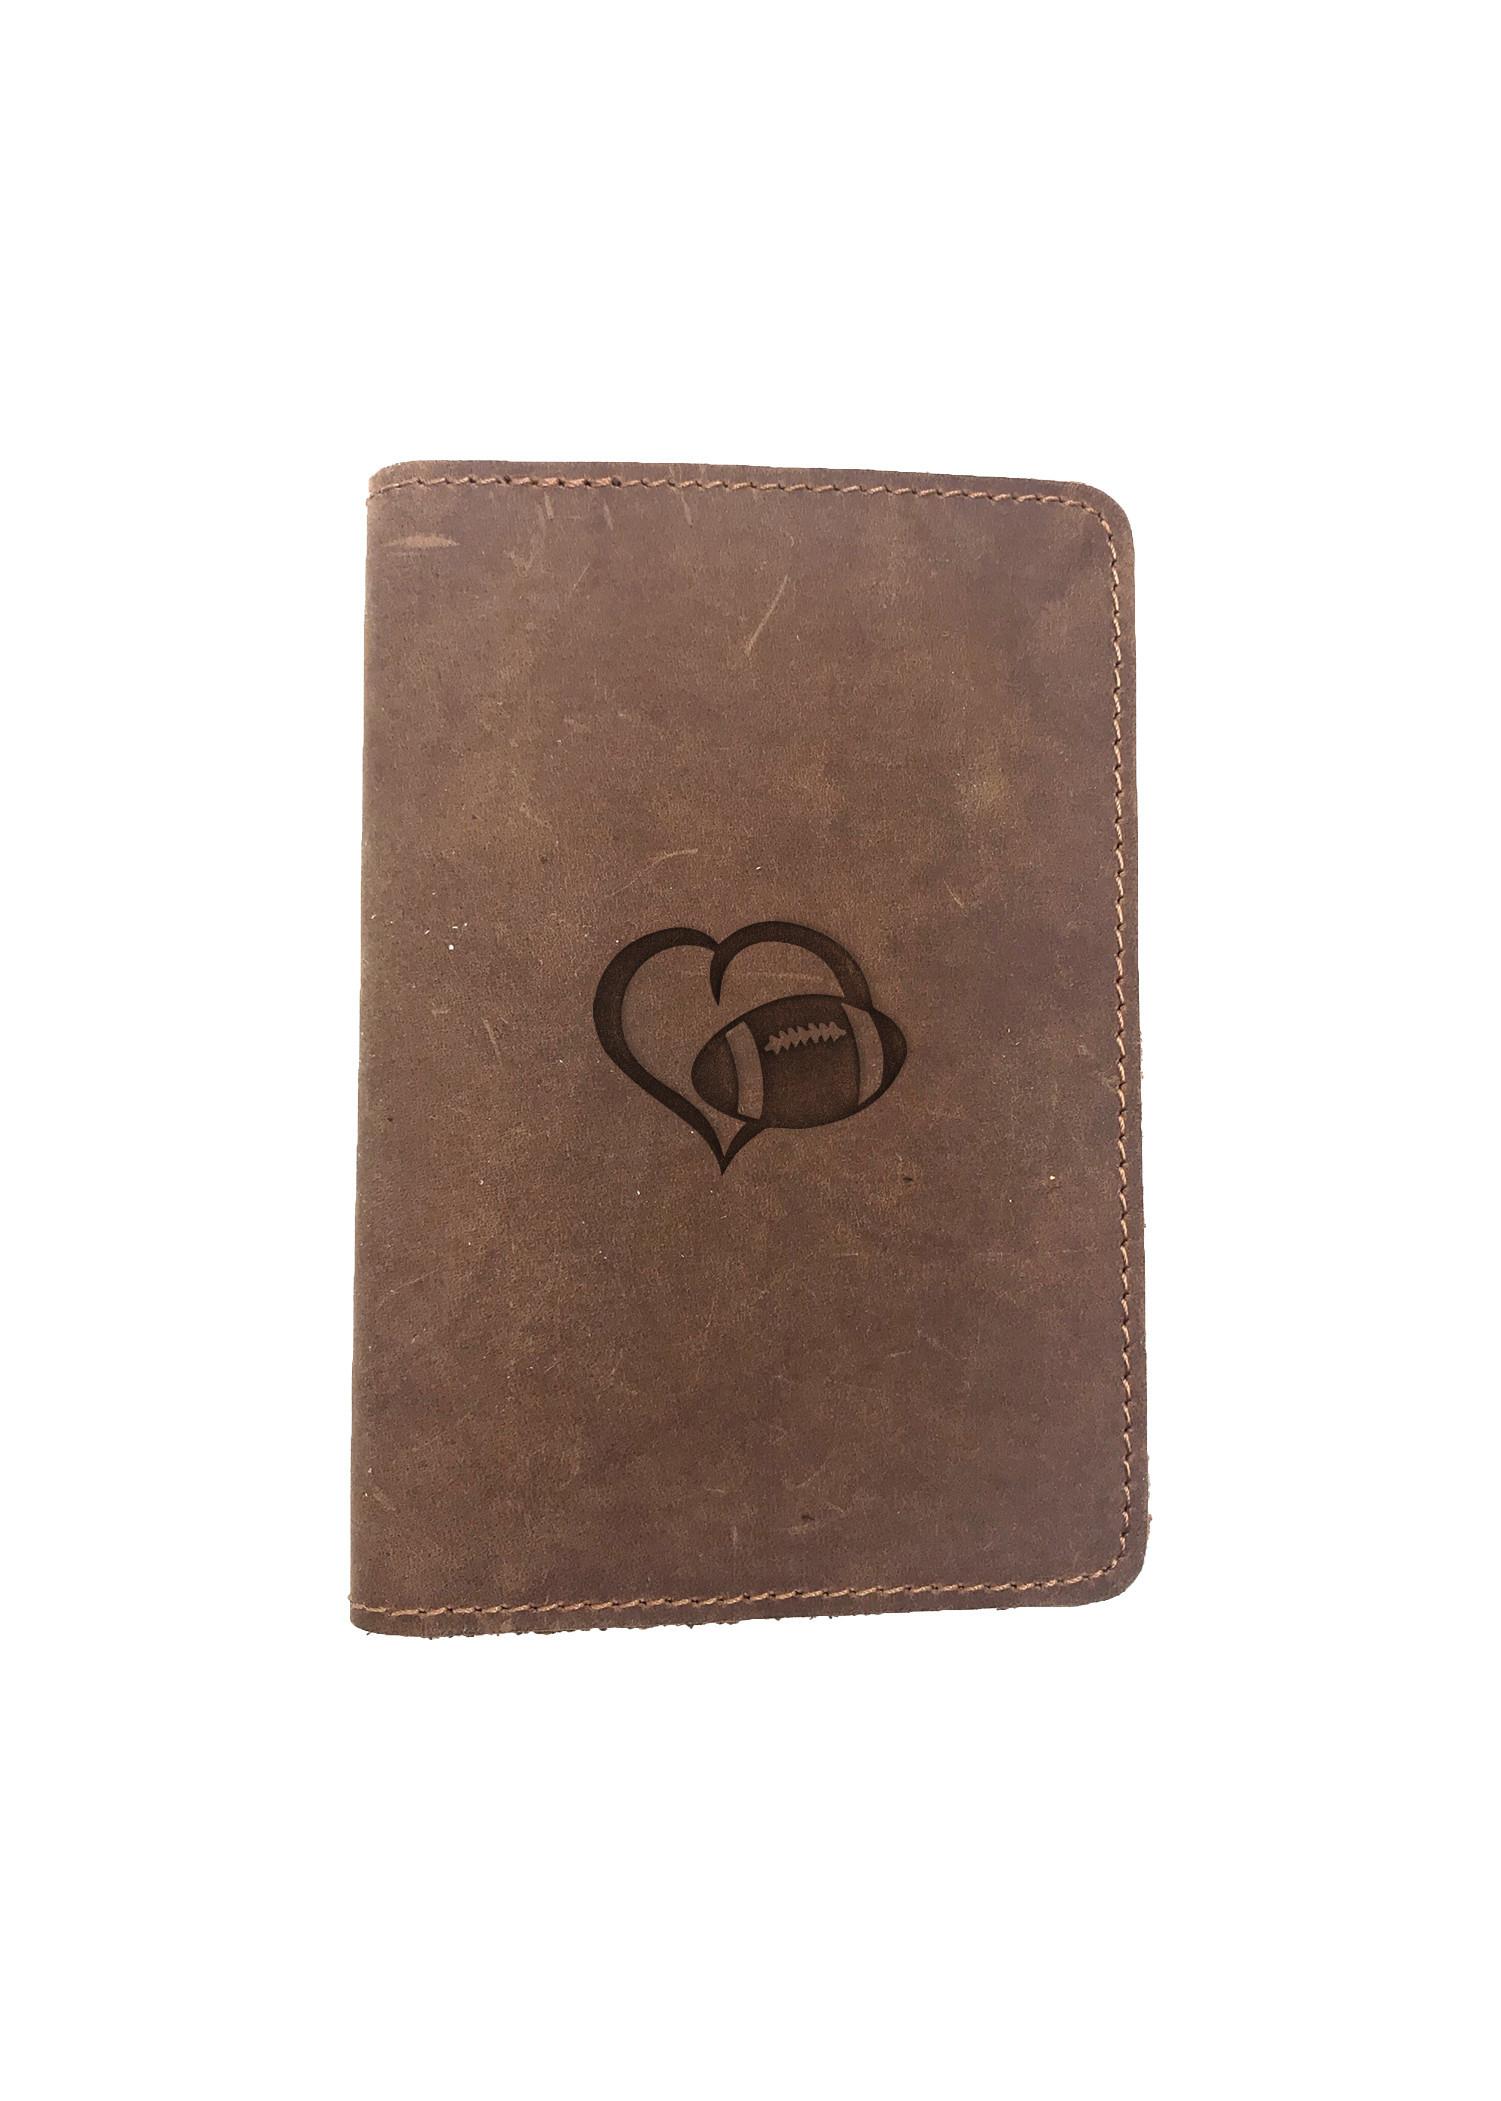 Passport Cover Bao Da Hộ Chiếu Da Sáp Khắc Hình Thể thao LOVE SPORTS (BROWN)